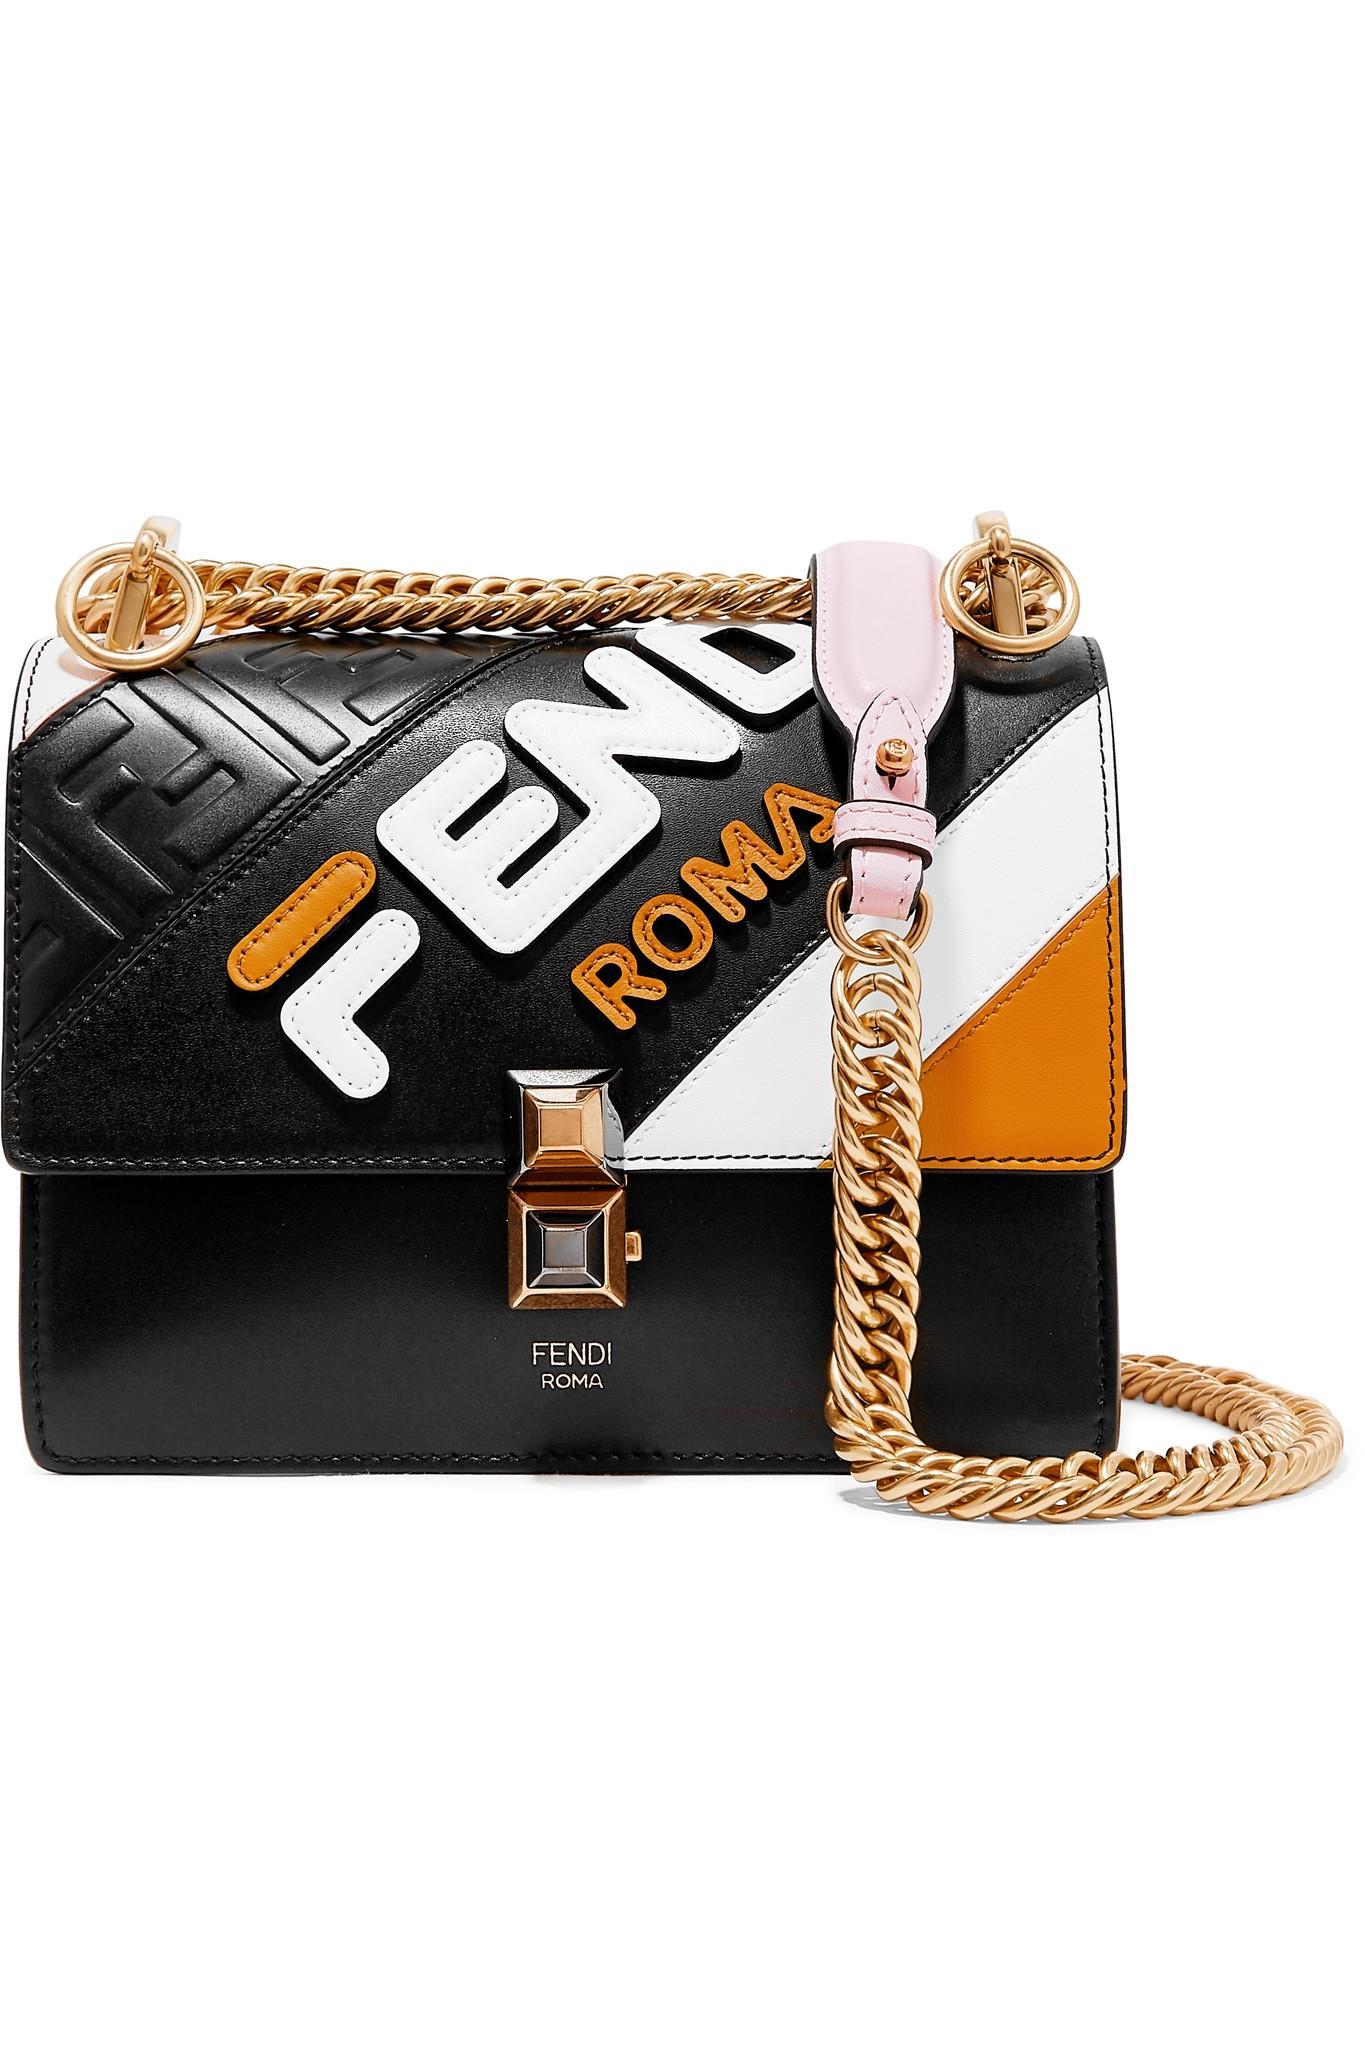 1519563bdb Fendi Kan I Mini Appliquéd Leather Shoulder Bag in Black - Lyst